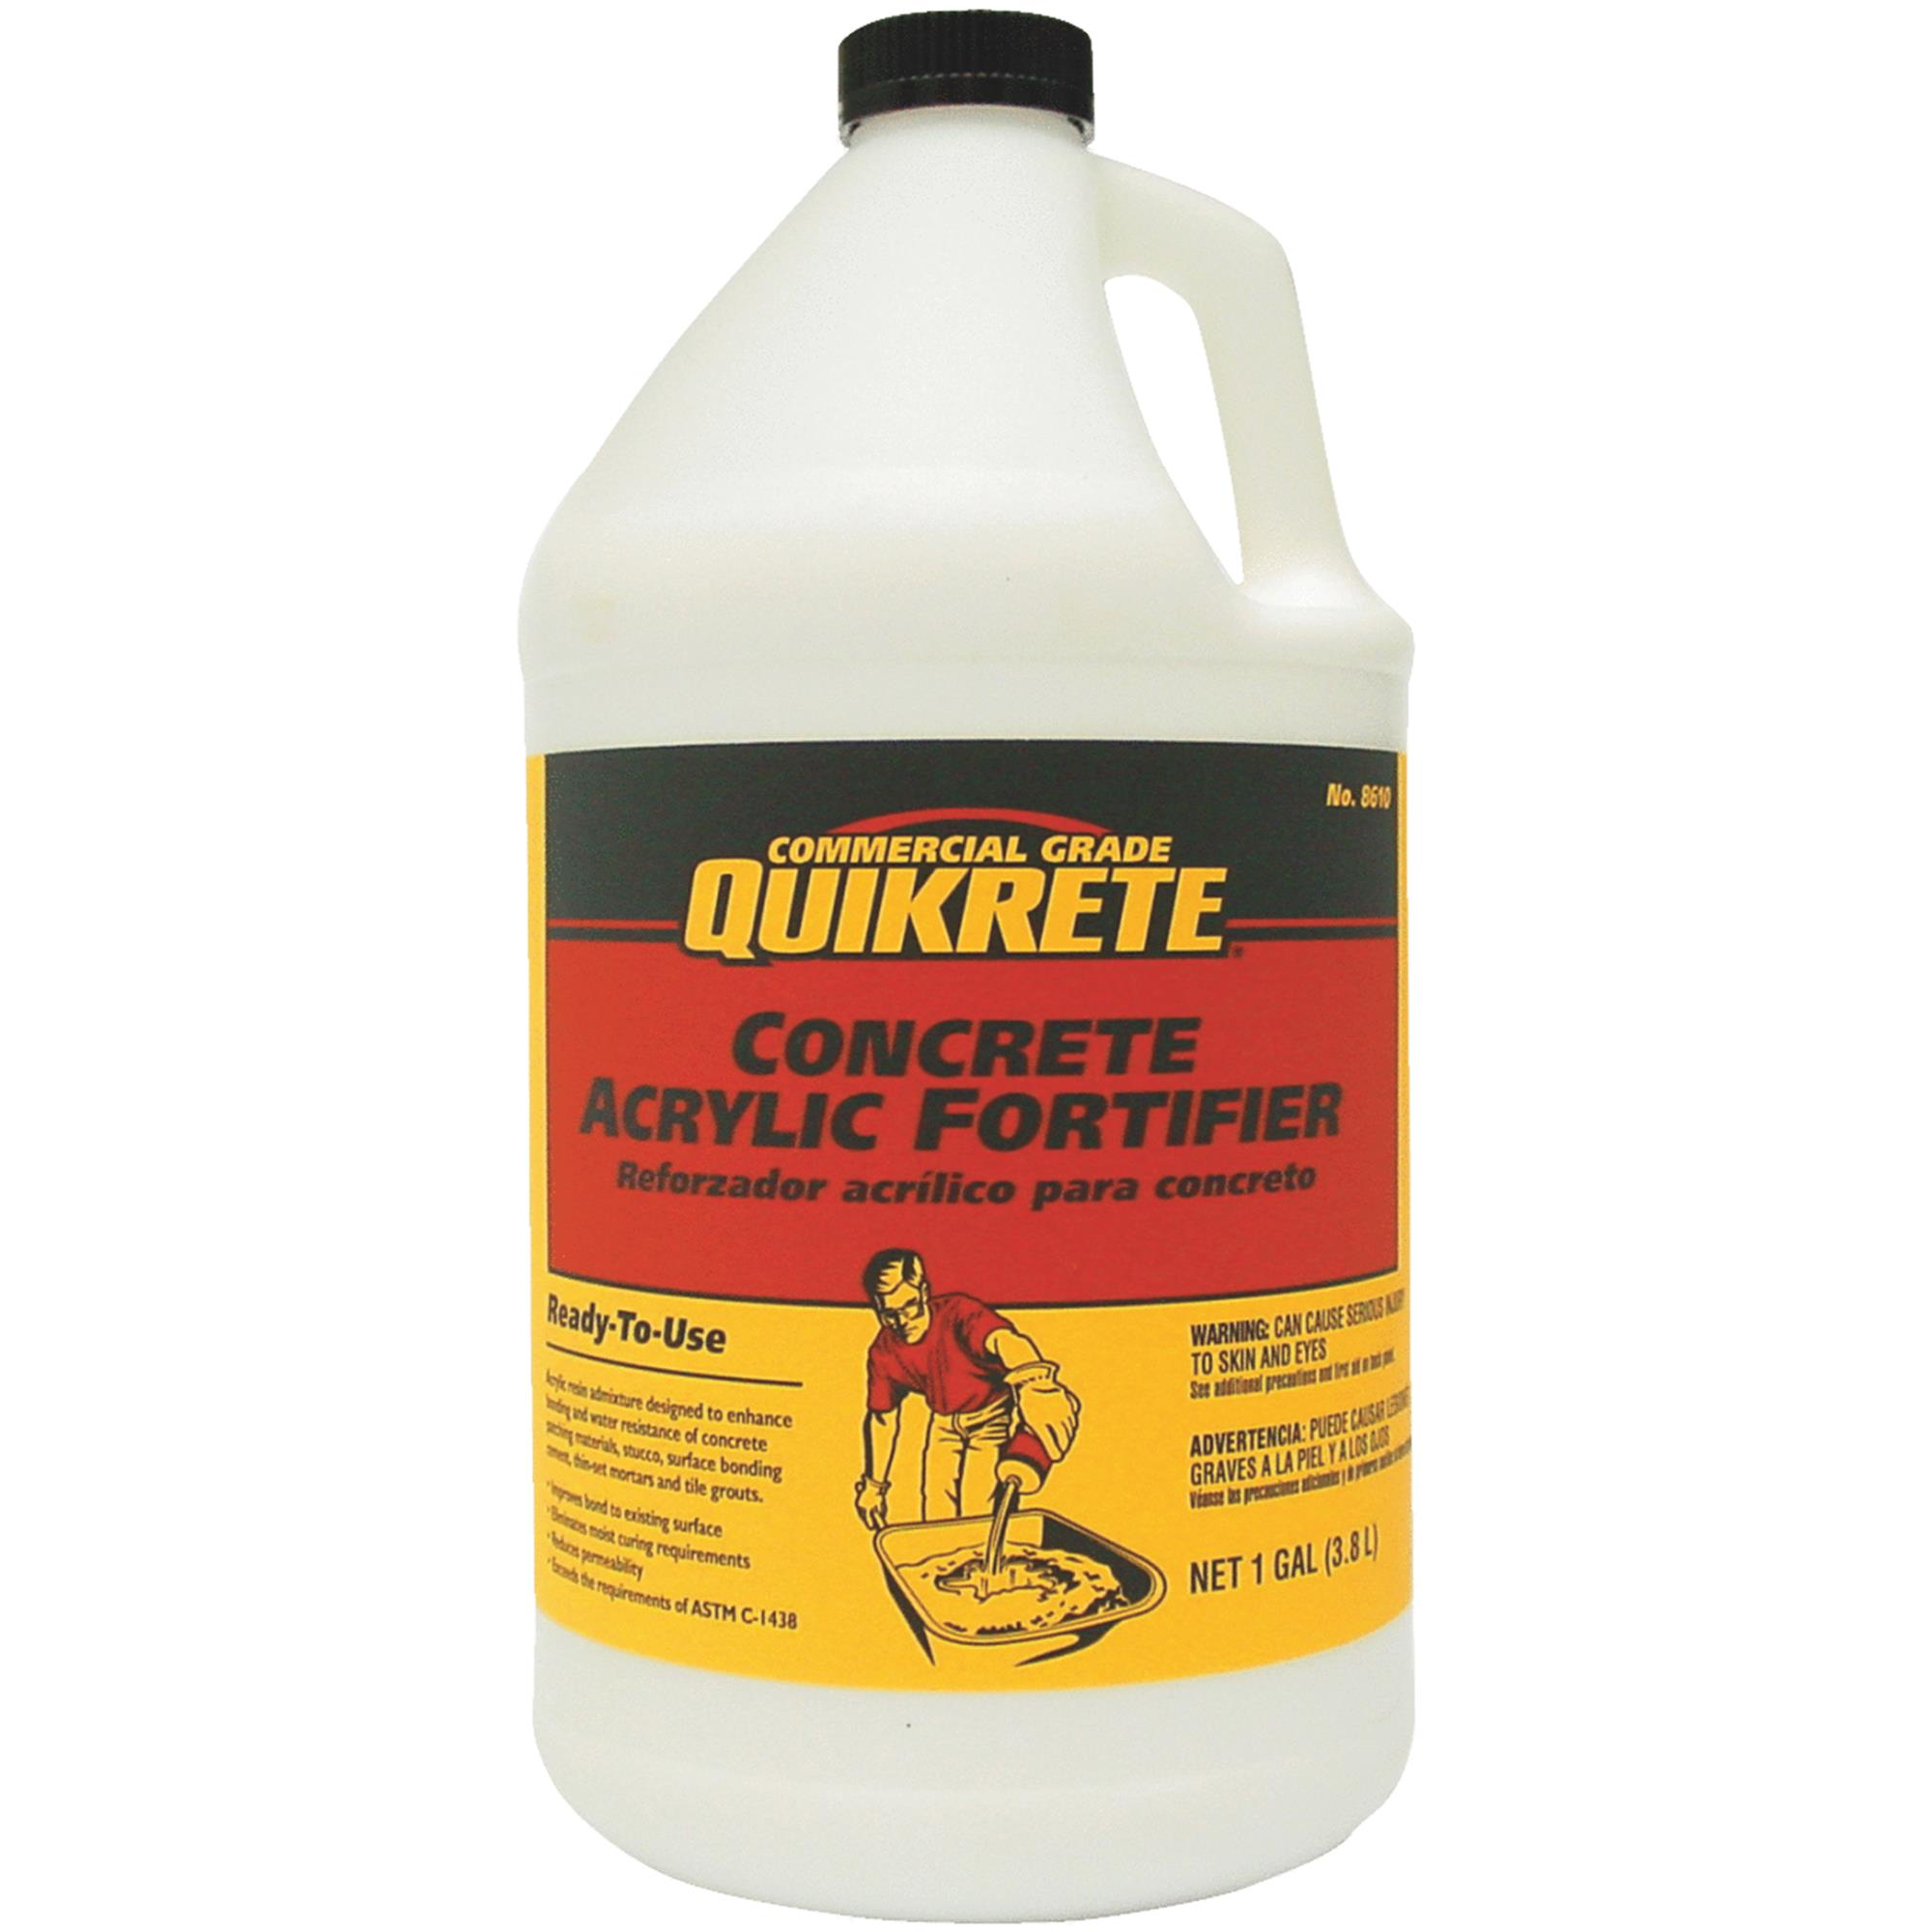 Quikrete Concrete Bonder Acrylic Fortifier by Quikrete